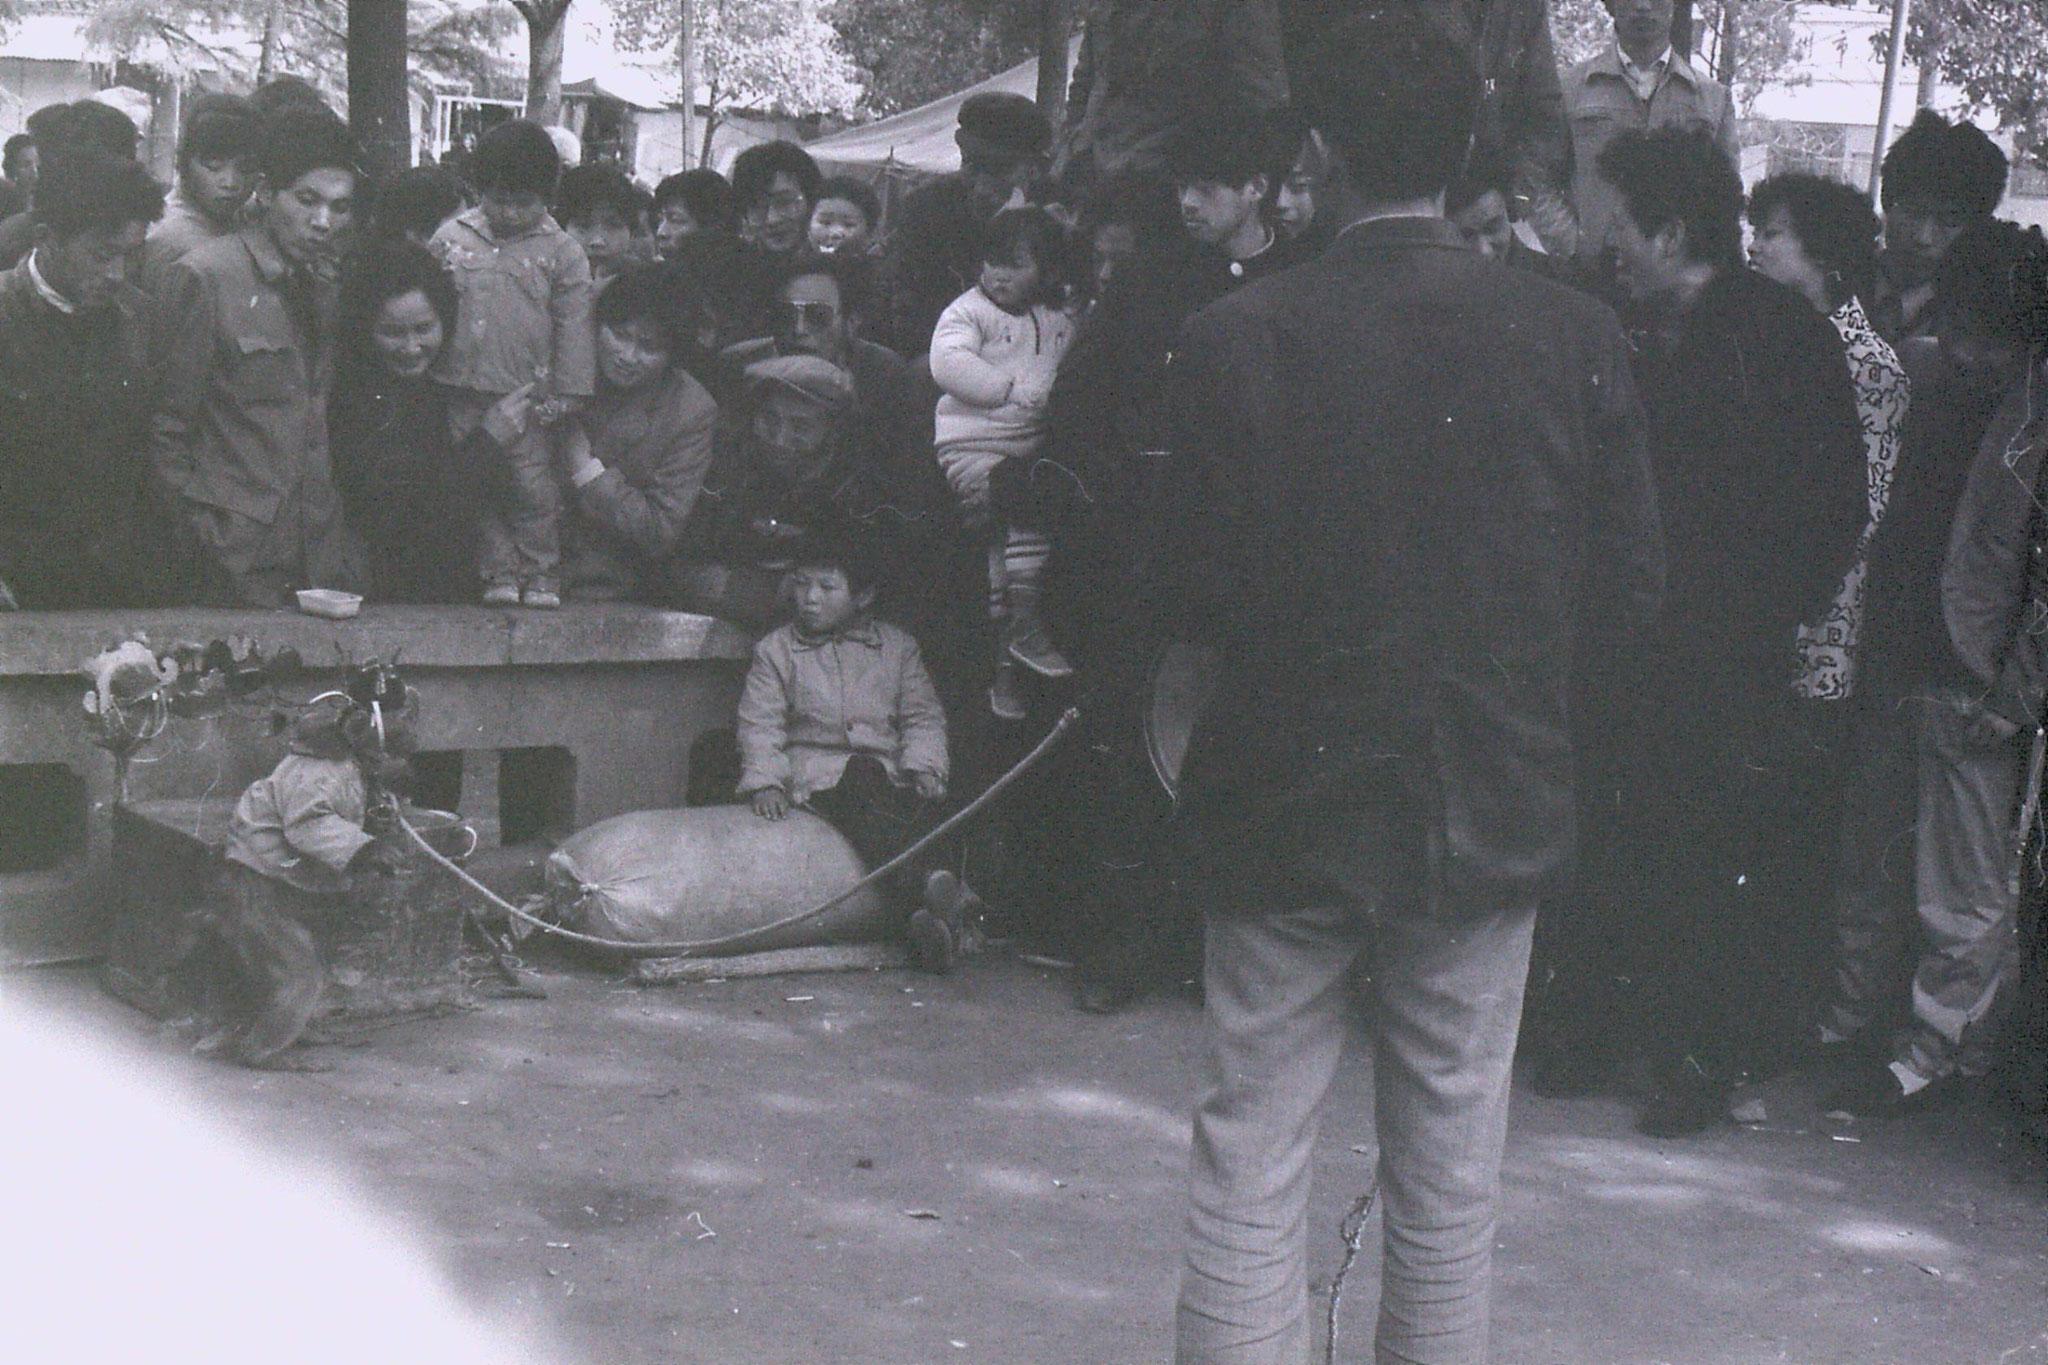 22/3/1989: 23: Suzhou